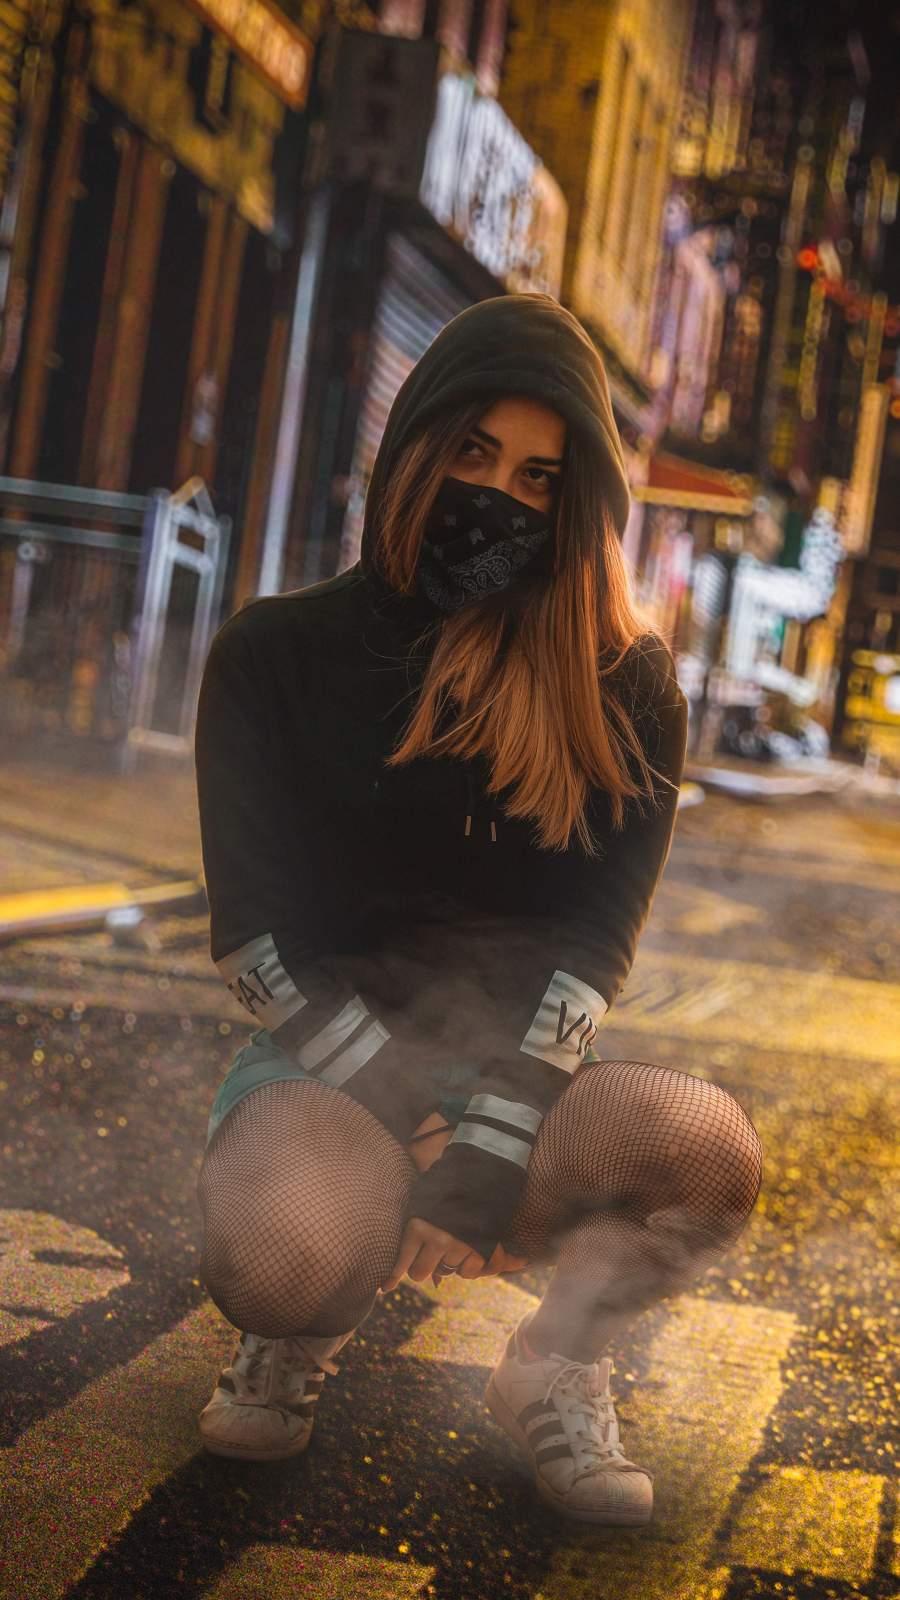 Hoodie Mask Girl